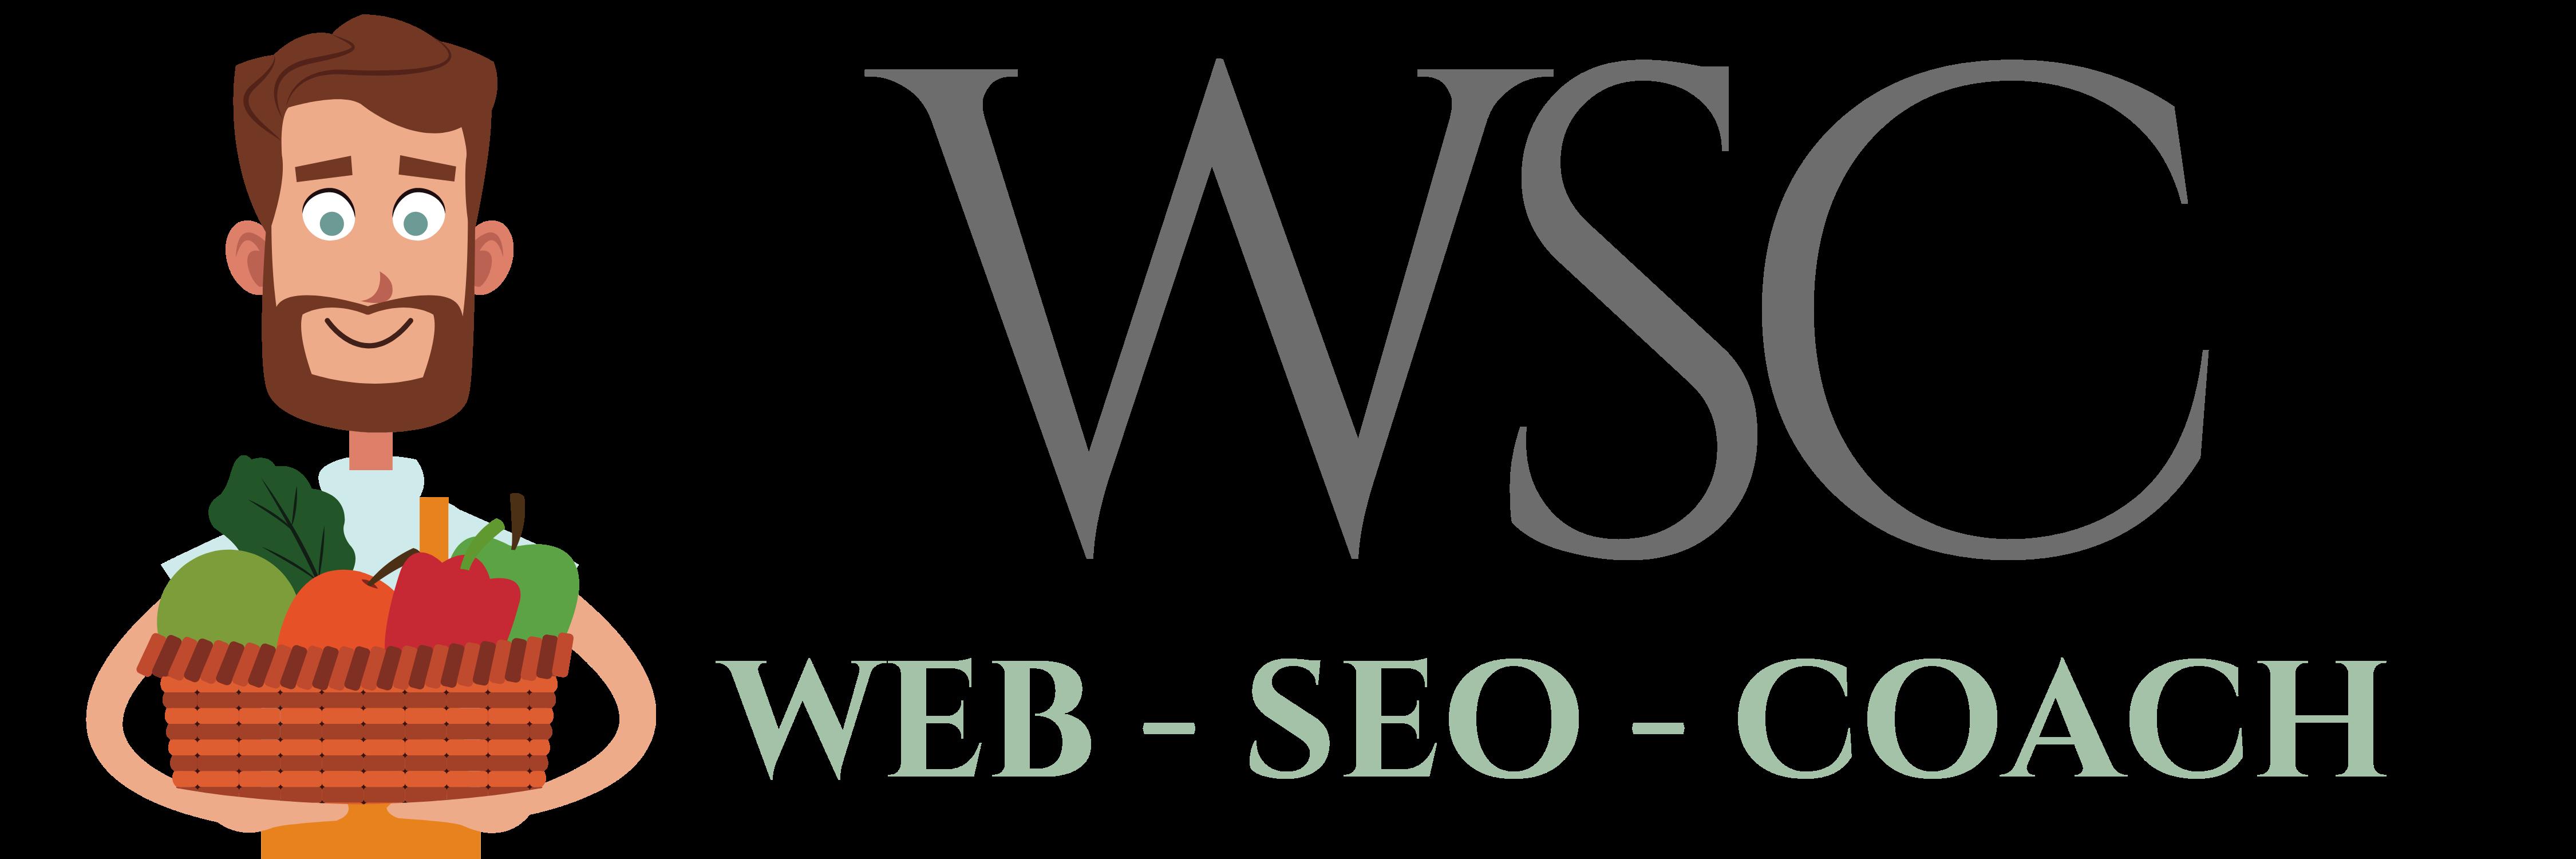 Wordpress and SEO Coach